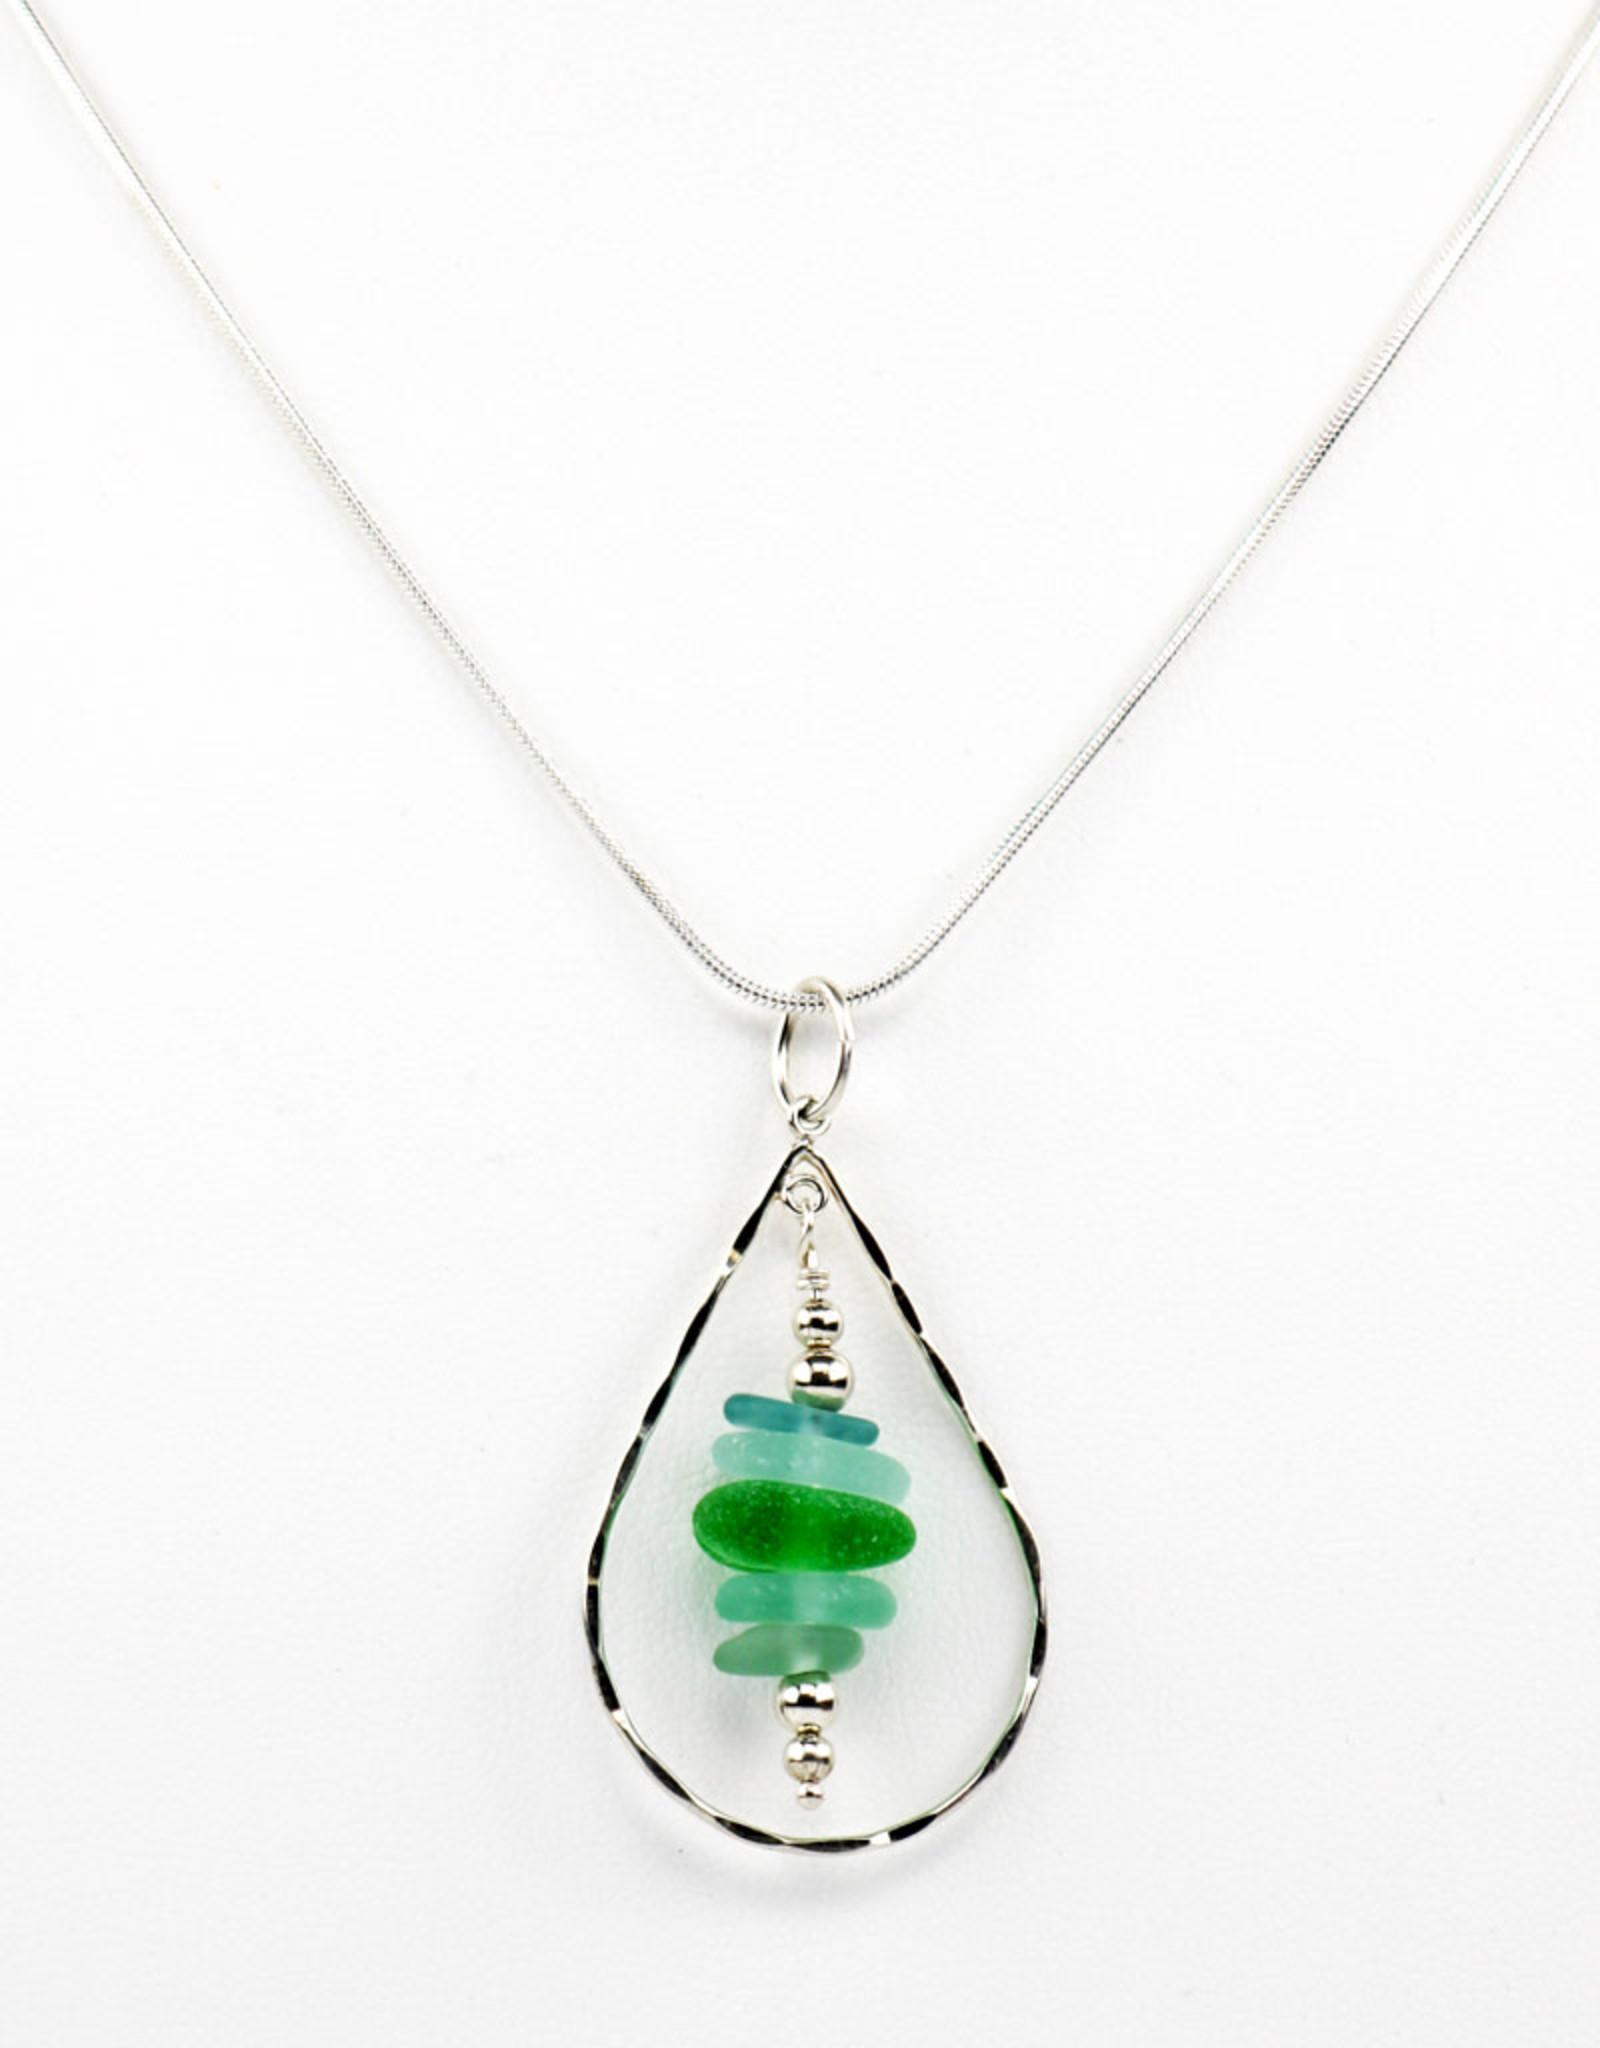 Odonata Pendulum Seaglass Necklace